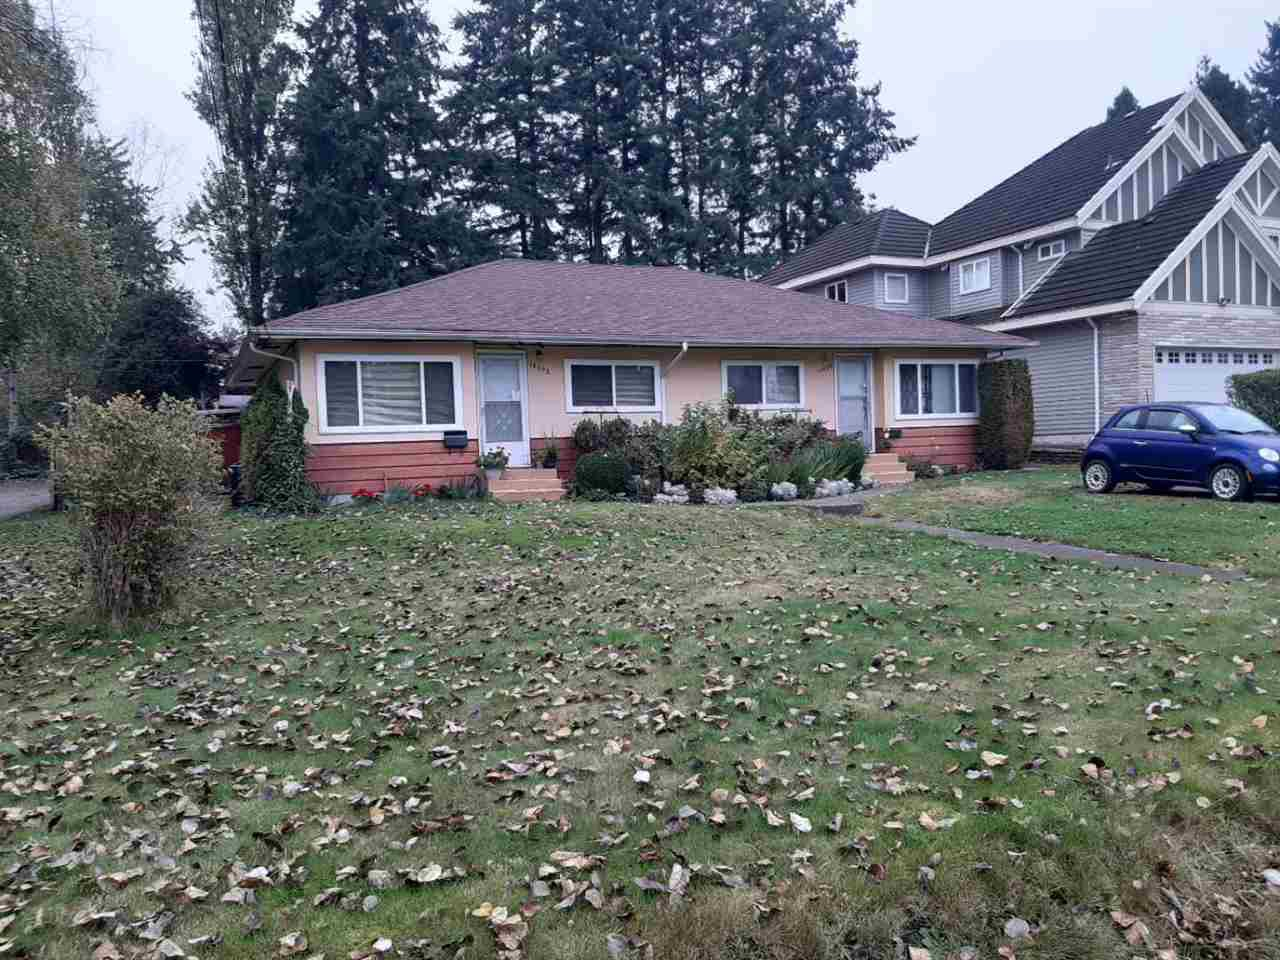 Main Photo: 10890 - 10892 139A Street in Surrey: Bolivar Heights Duplex for sale (North Surrey)  : MLS®# R2510256